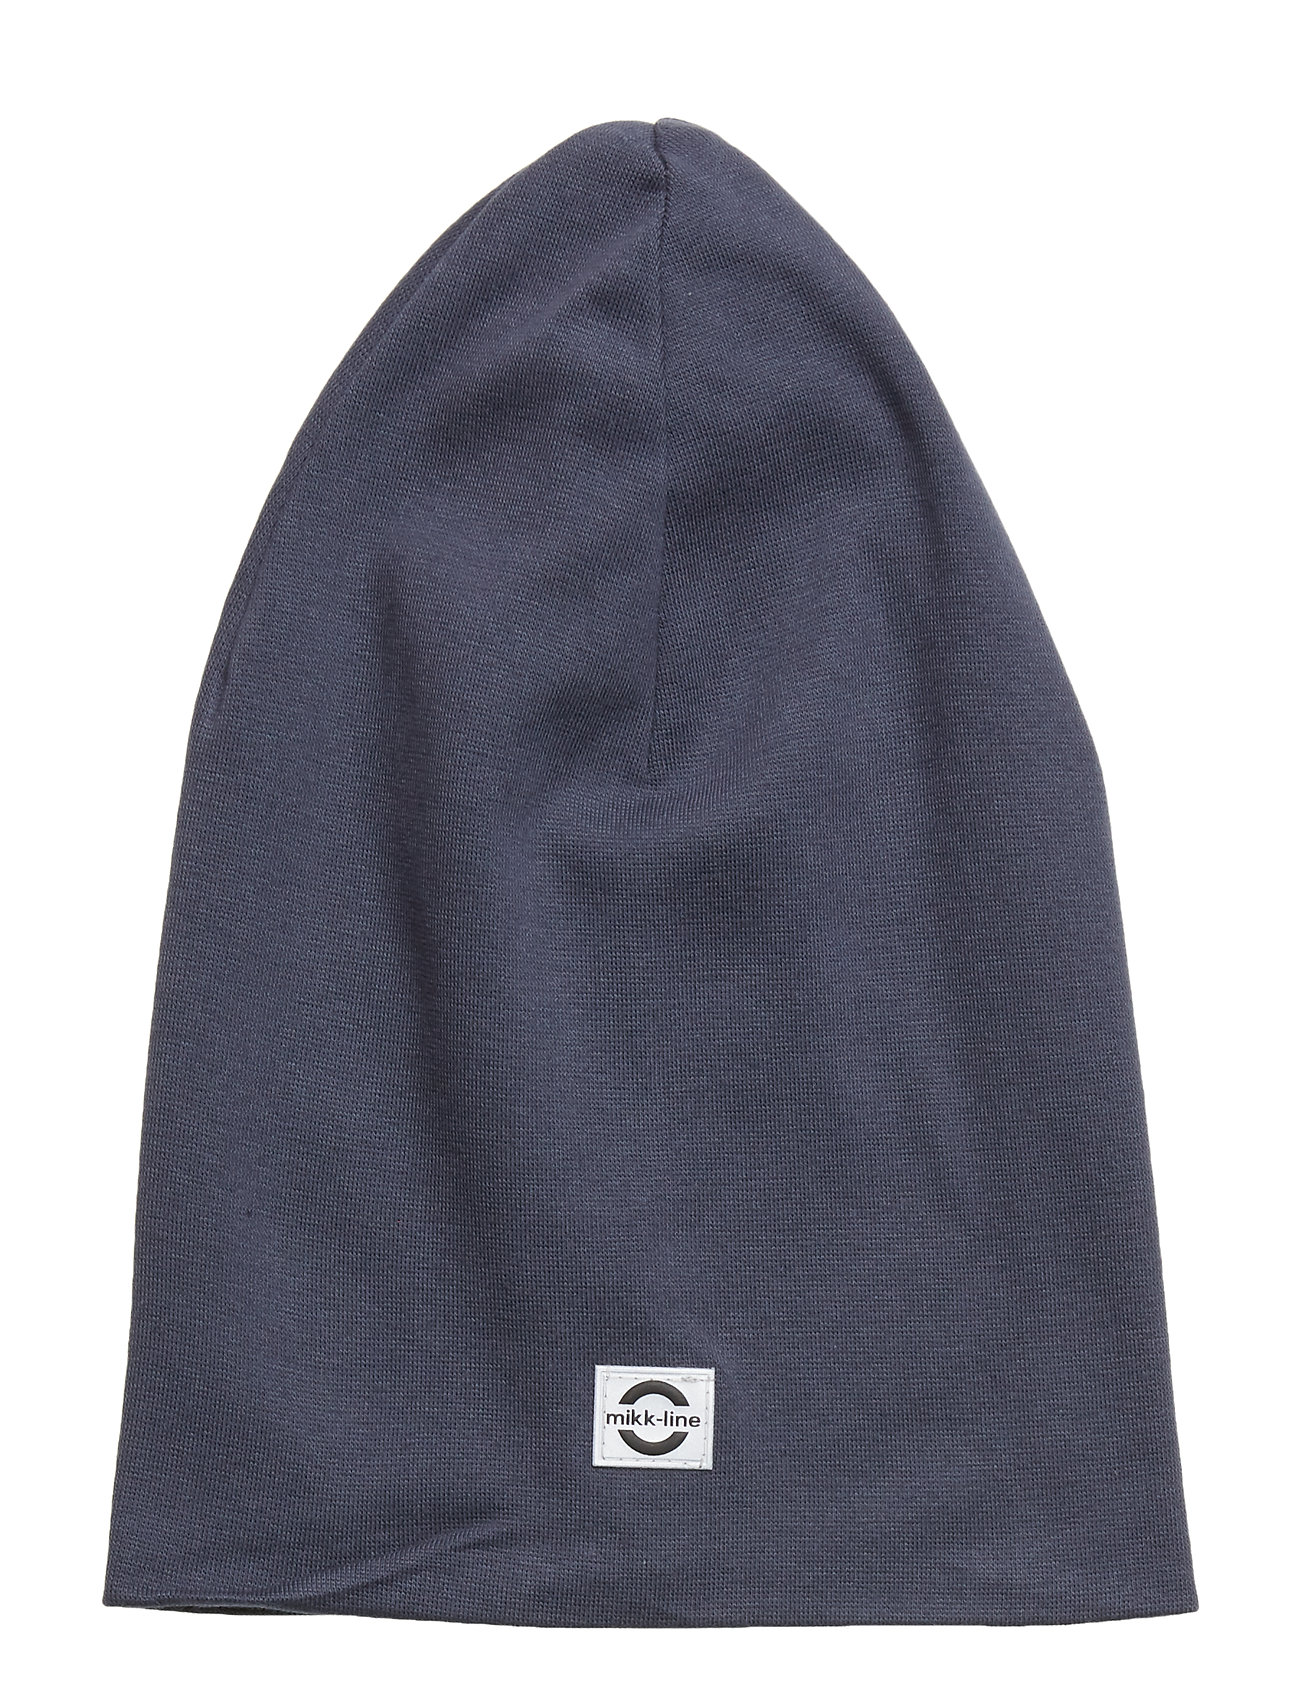 Image of Cotton Long Hat Accessories Headwear Hats Blå Mikk-Line (3406172917)